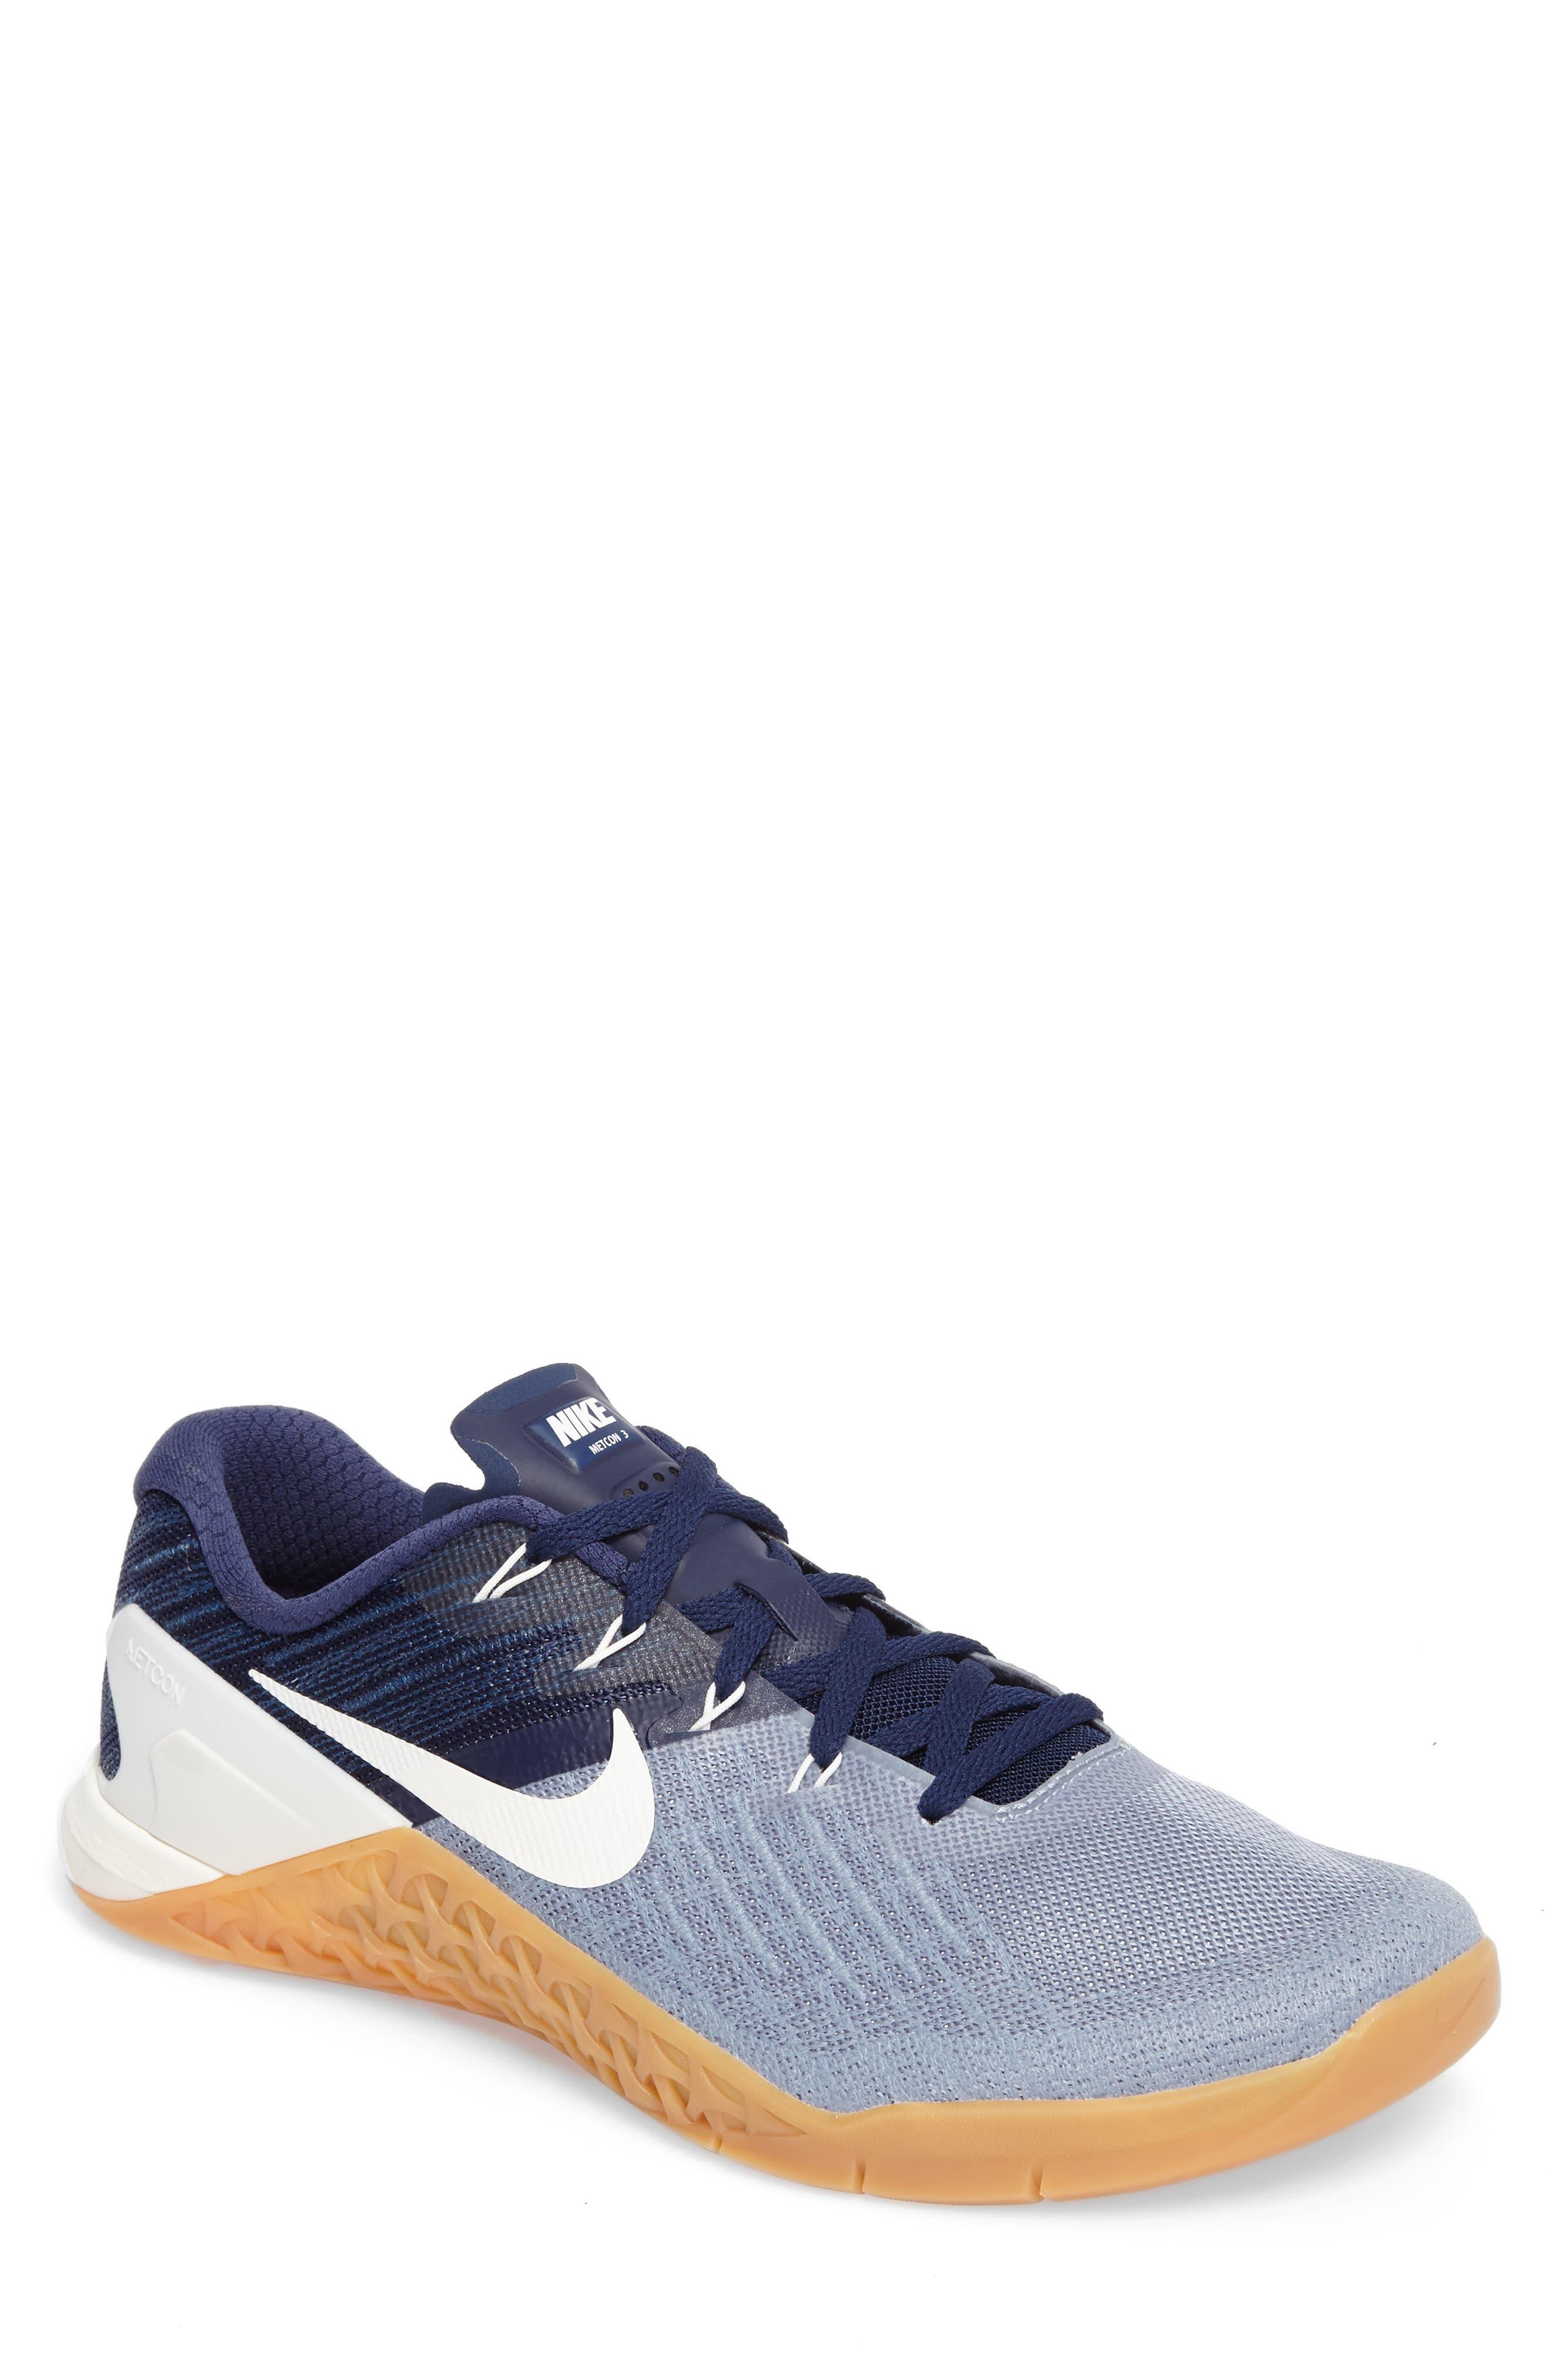 Nike Metcon 3 Training Shoe (Men)